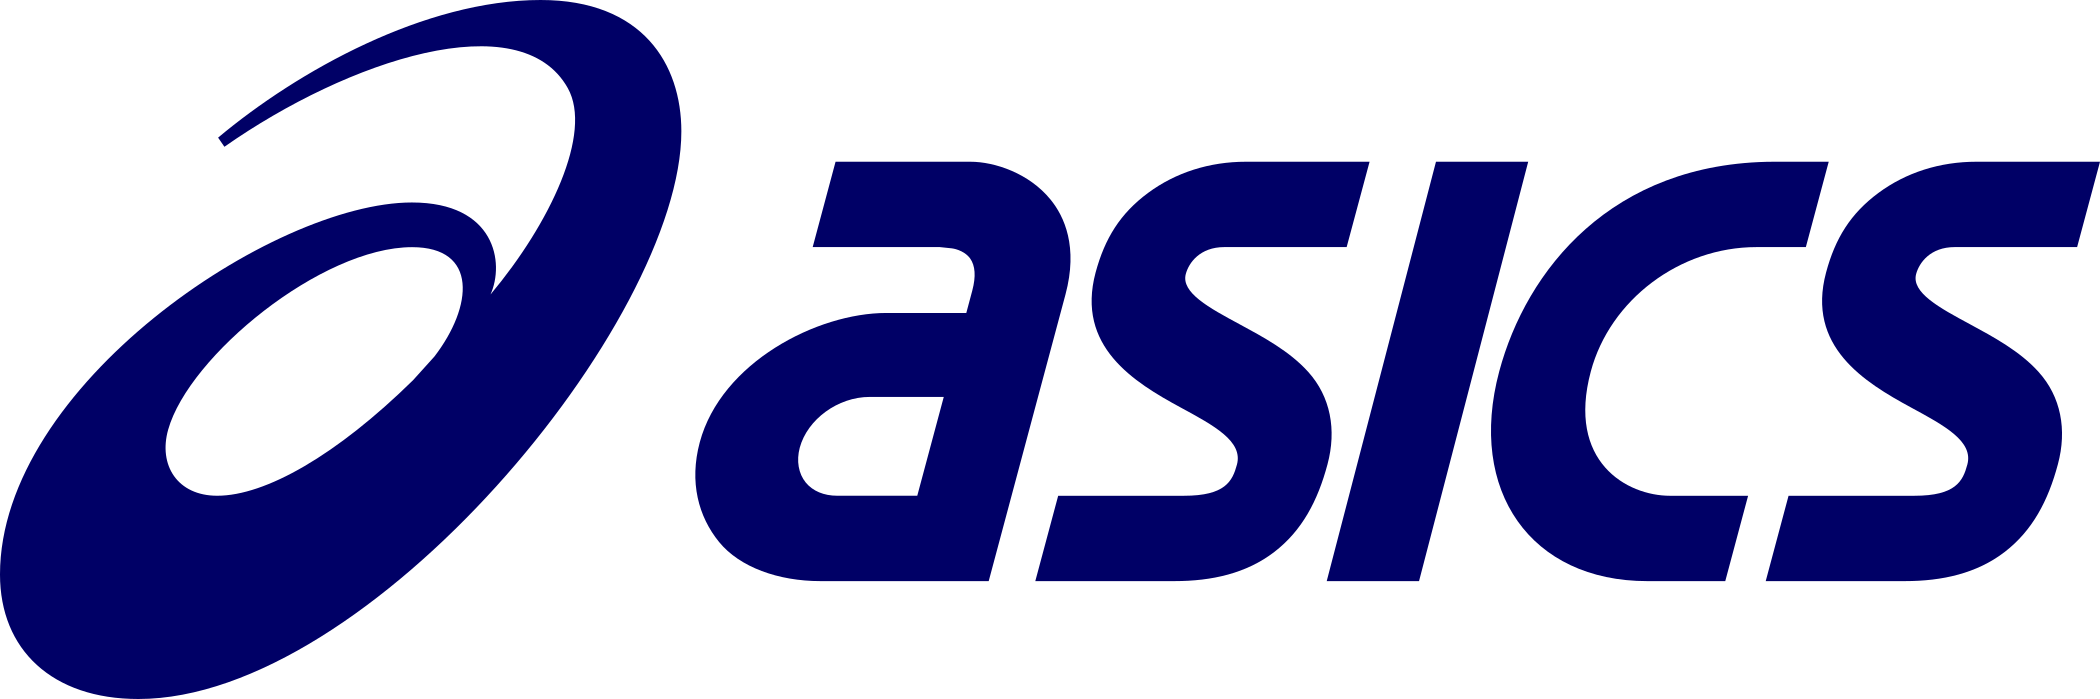 asics logo 1 - ASICS Logo